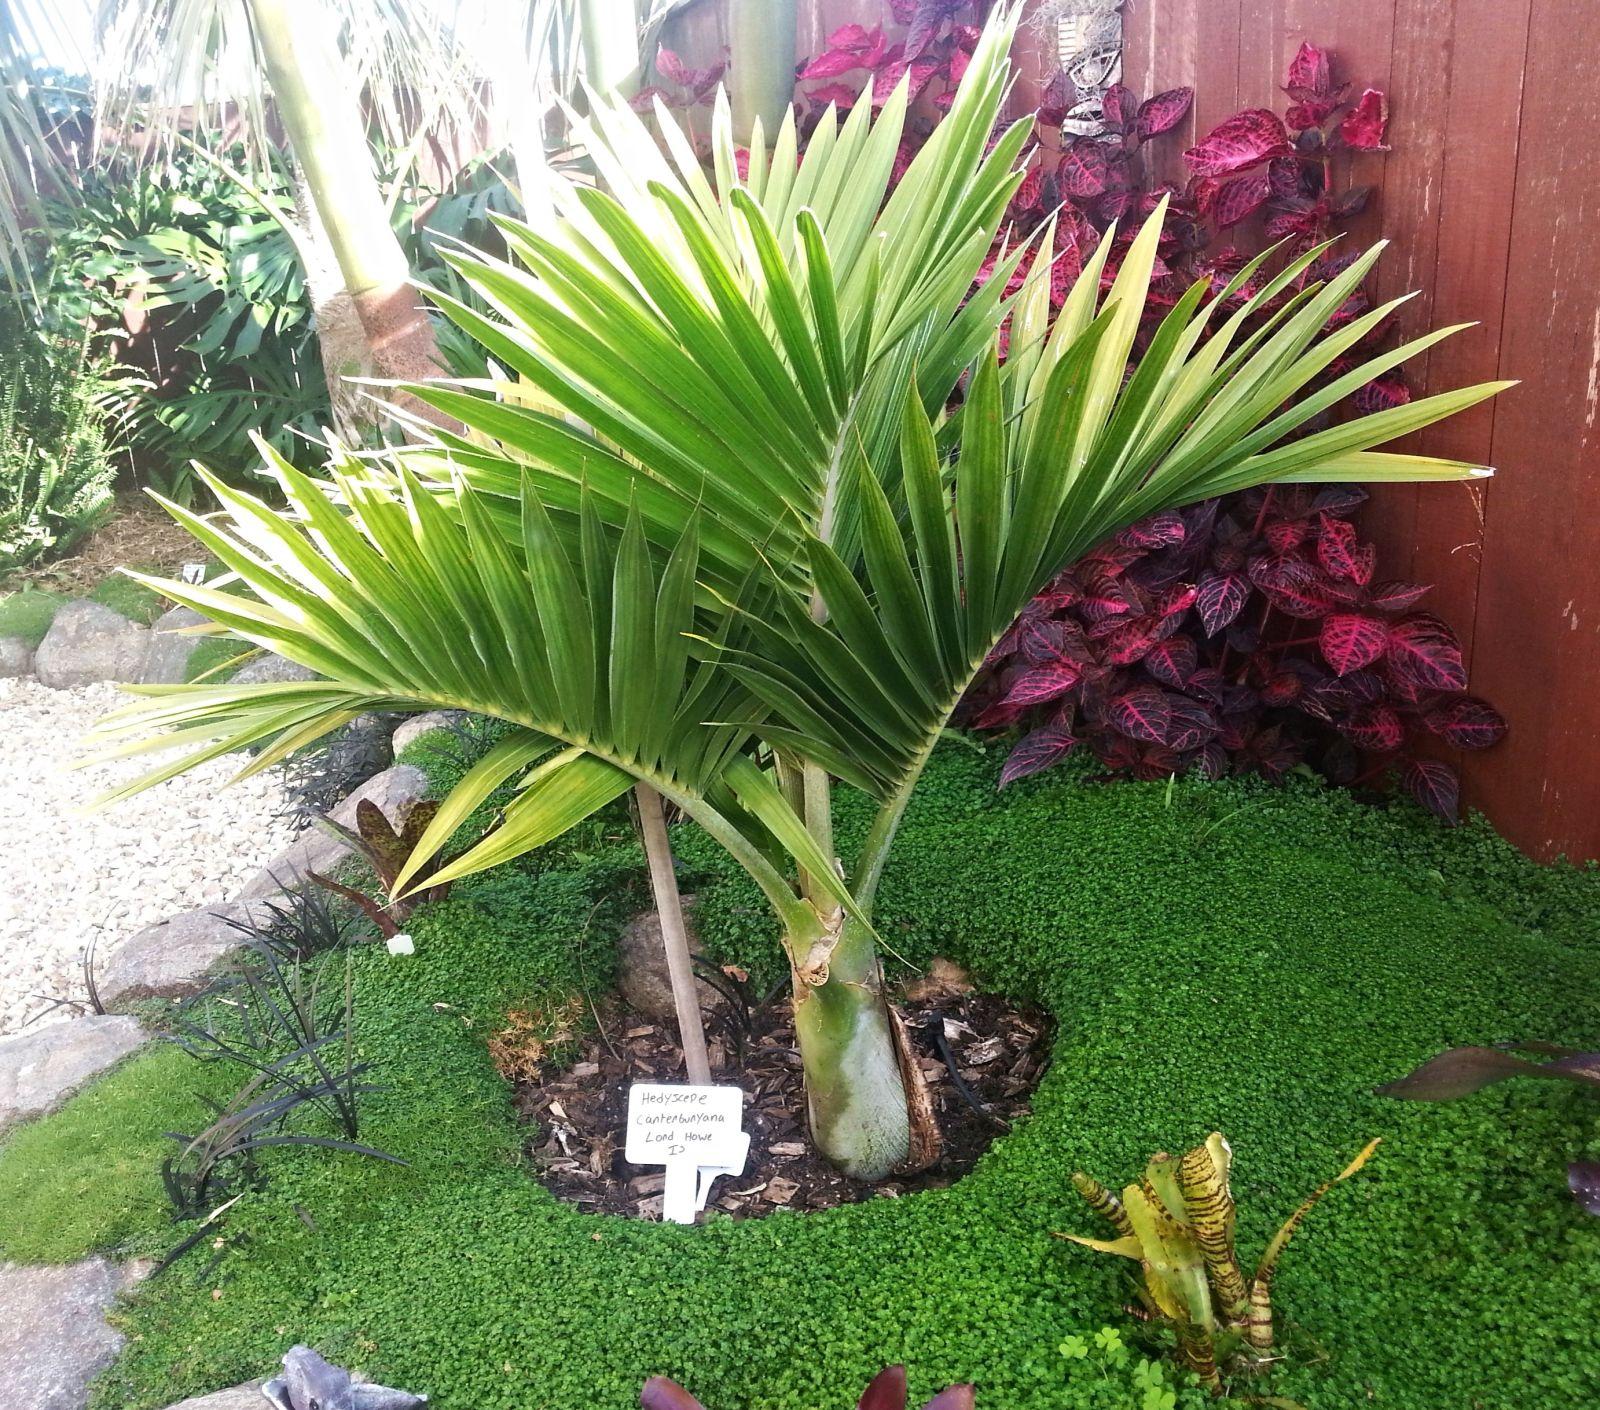 Growing tropical palms indoors - Tropics @Home